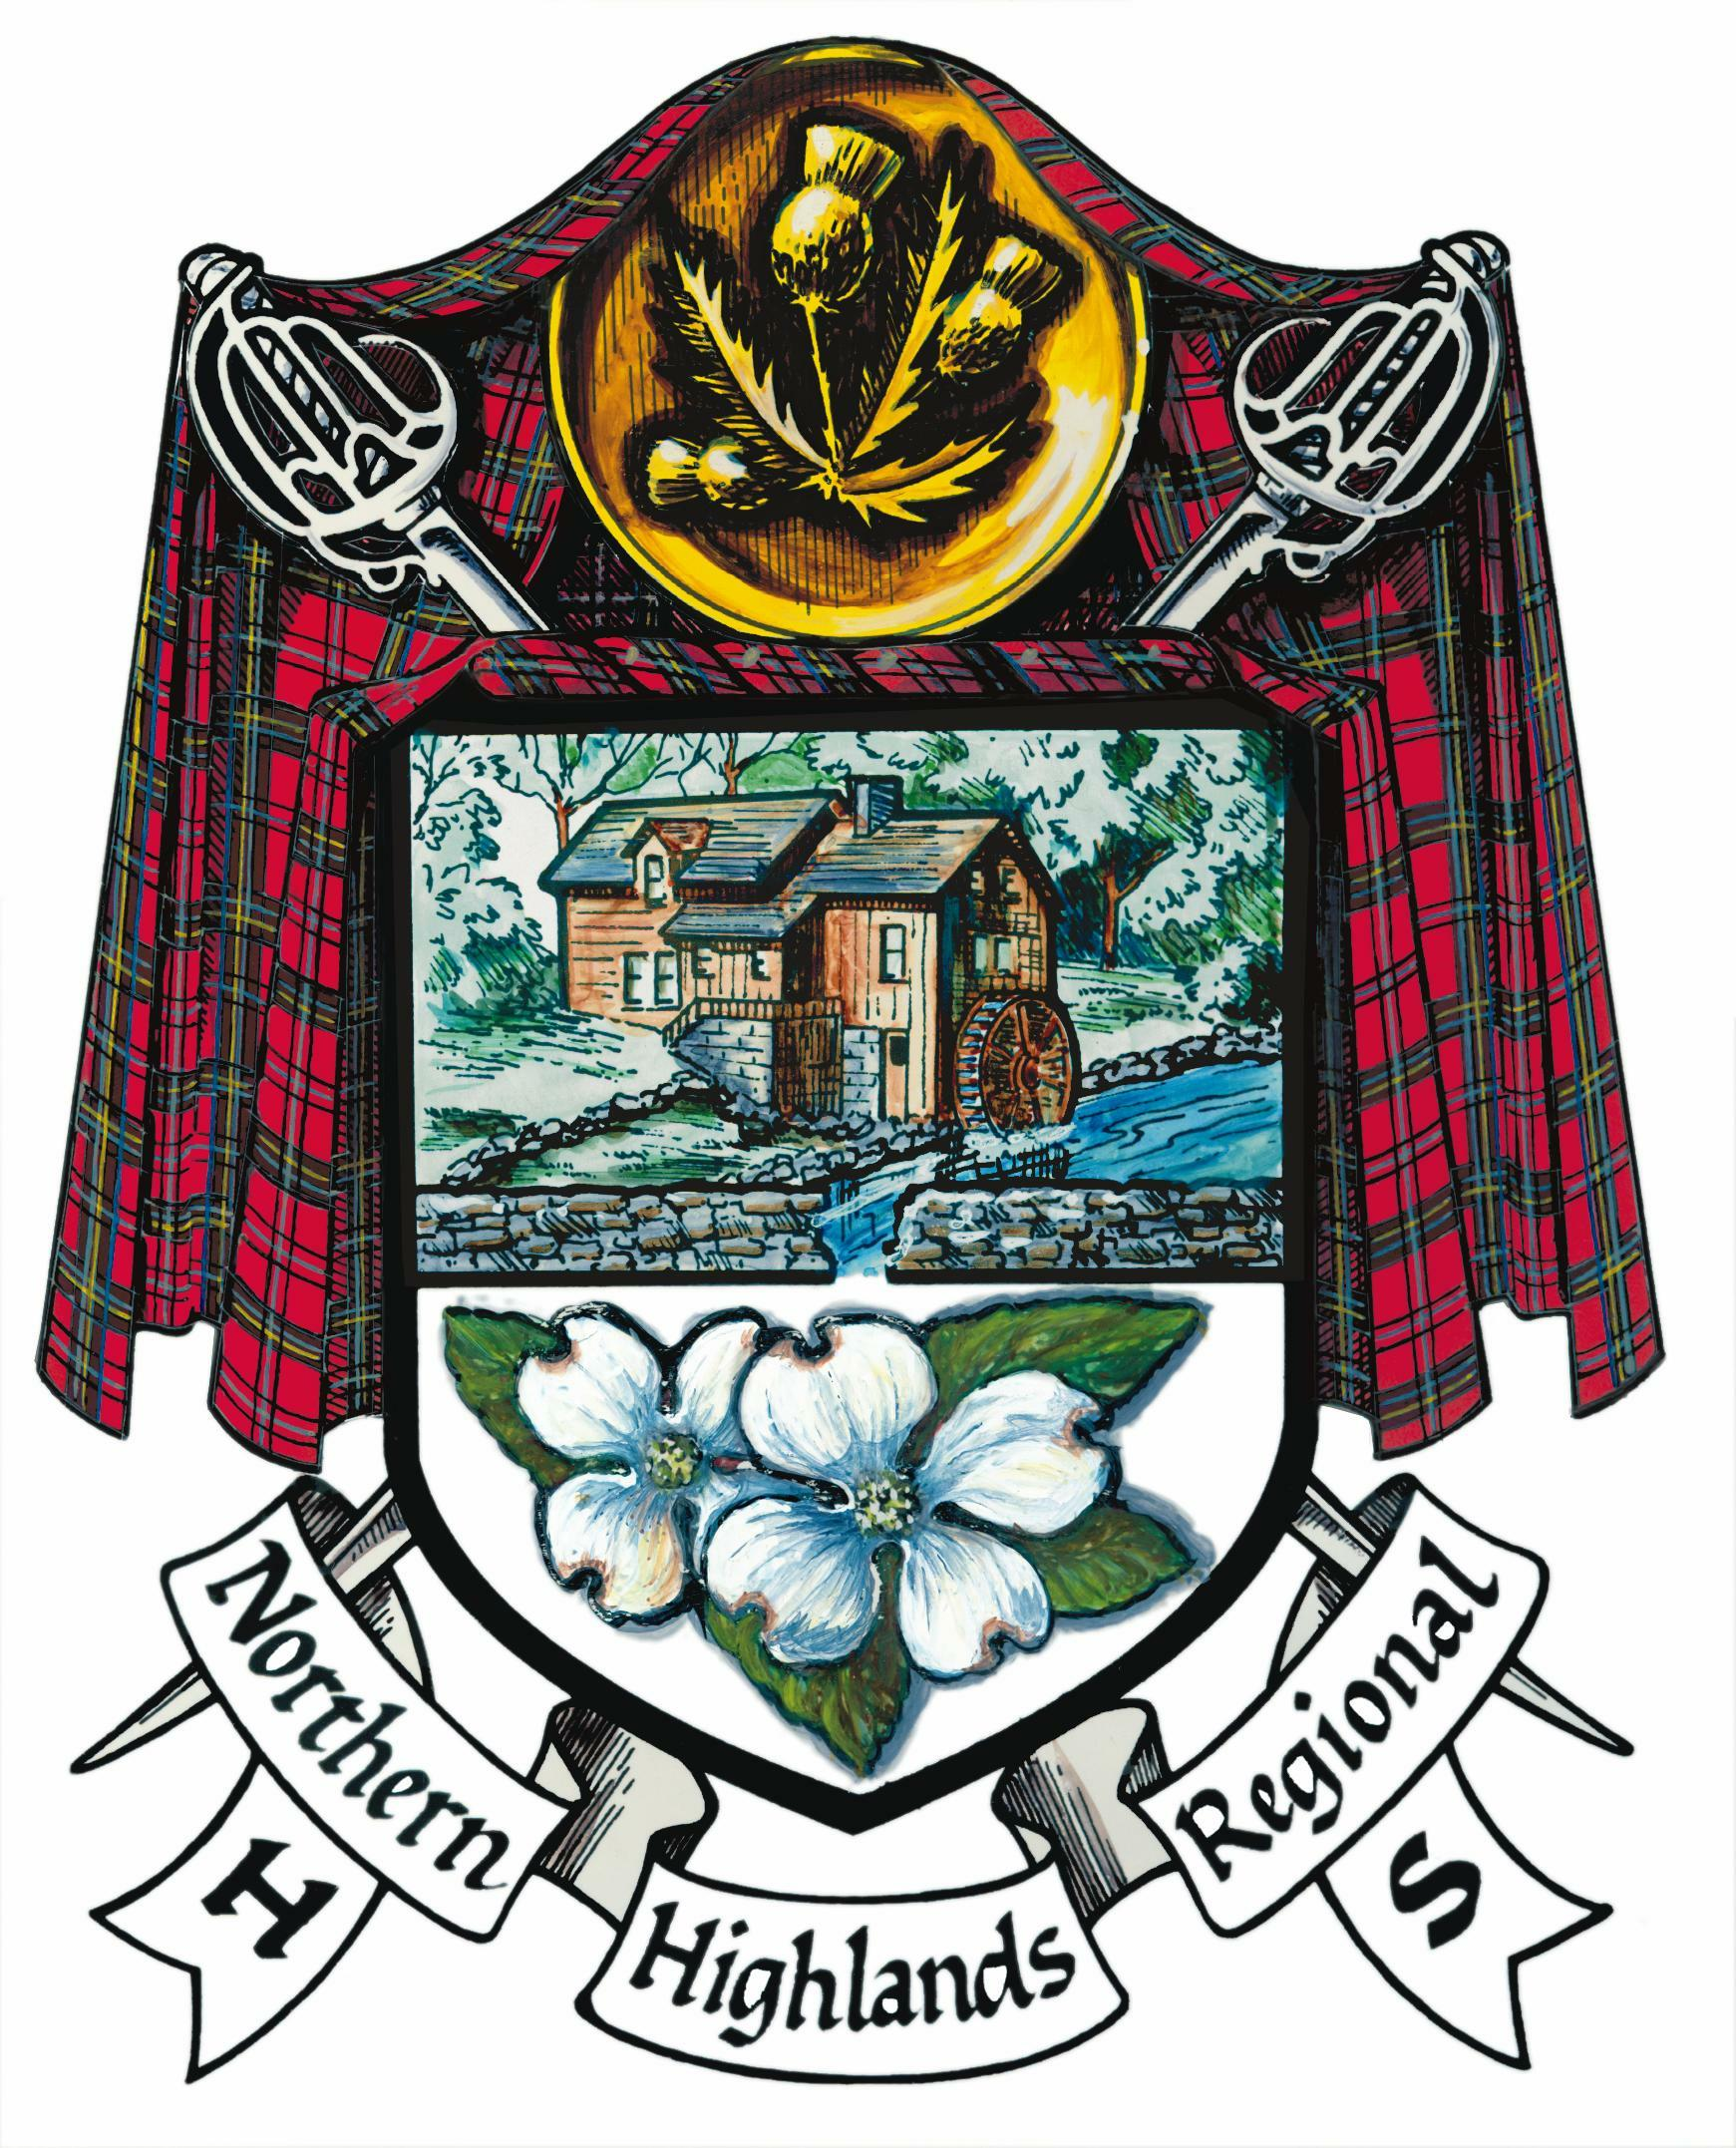 Highland games nj